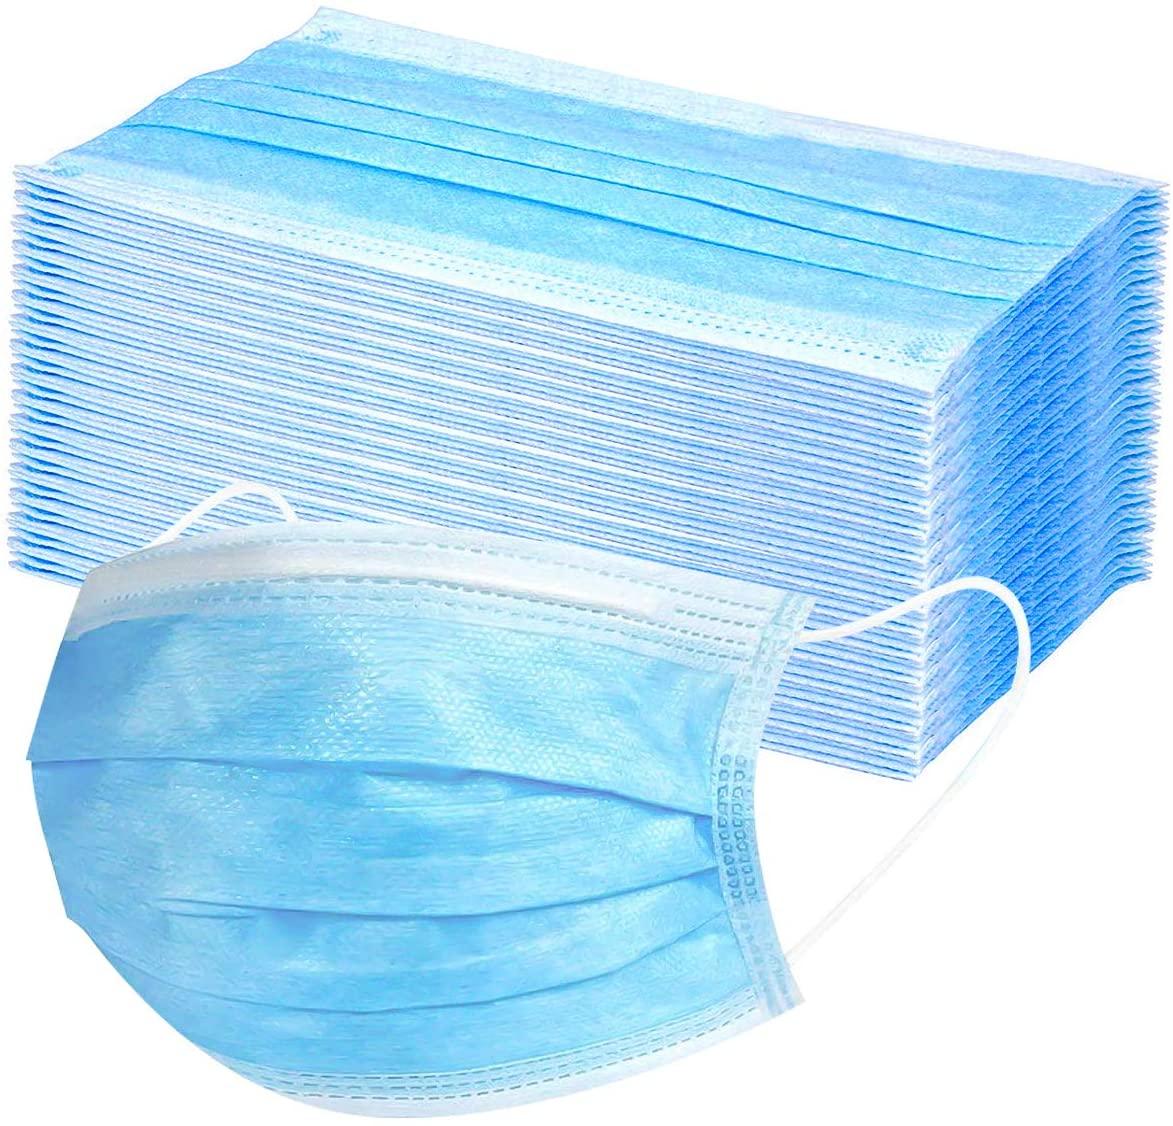 Máscara Descartável Tripla Camada Com Elástico - Pacote com 50 Unidades